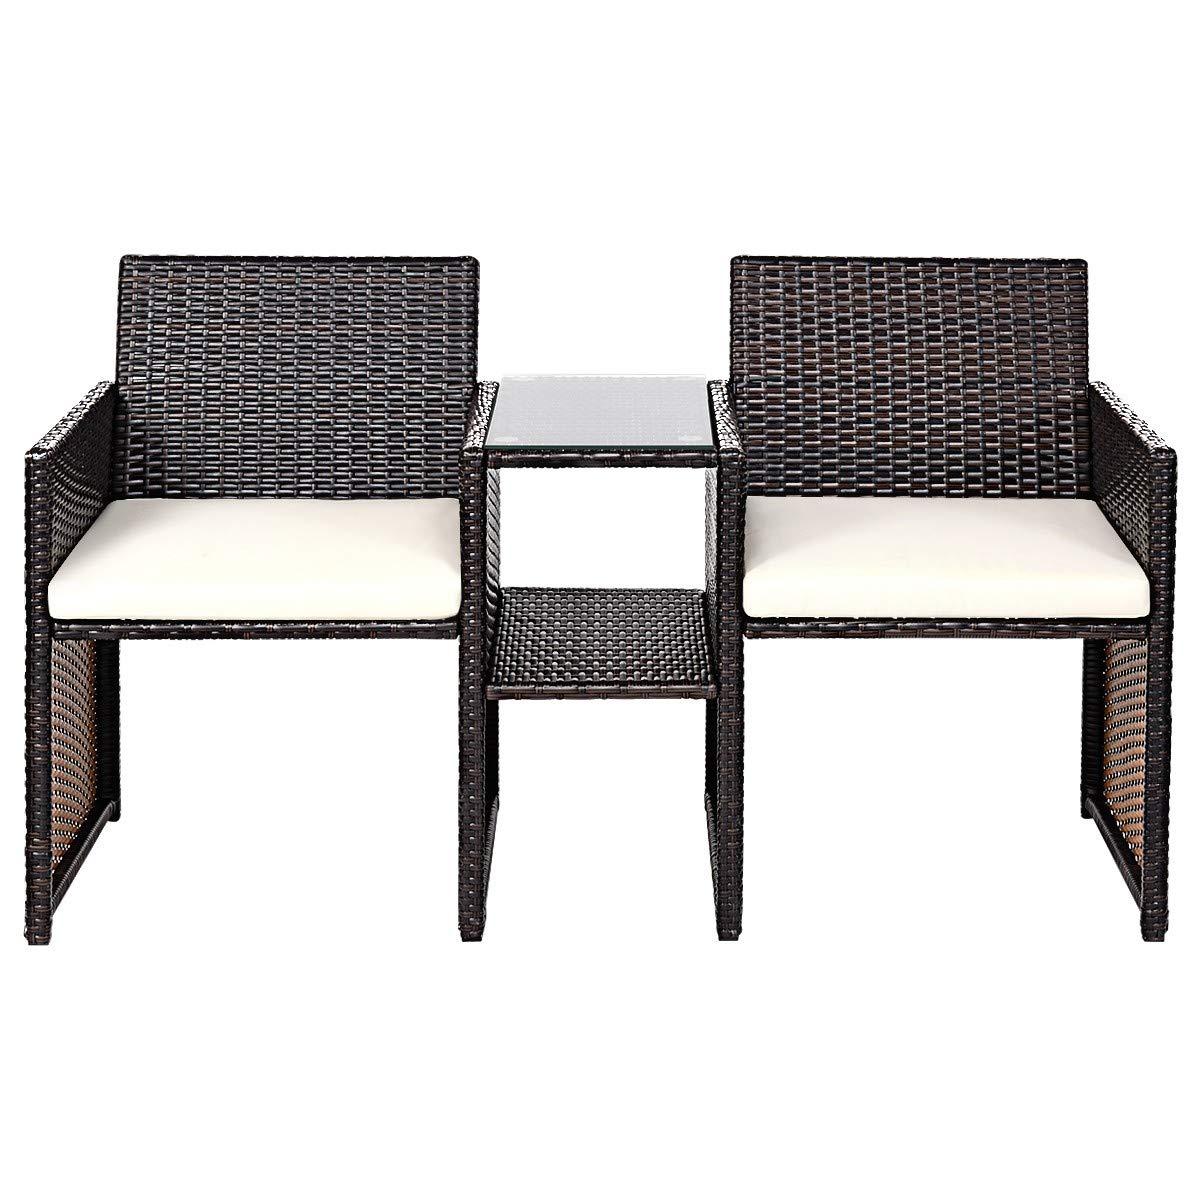 LeZhel Shop Brand New and Patio Rattan Conversation Cushioned Seat Sofa Set Stylish Contemporary Design Durable Lightweight Galvanized Steel Tube Construction